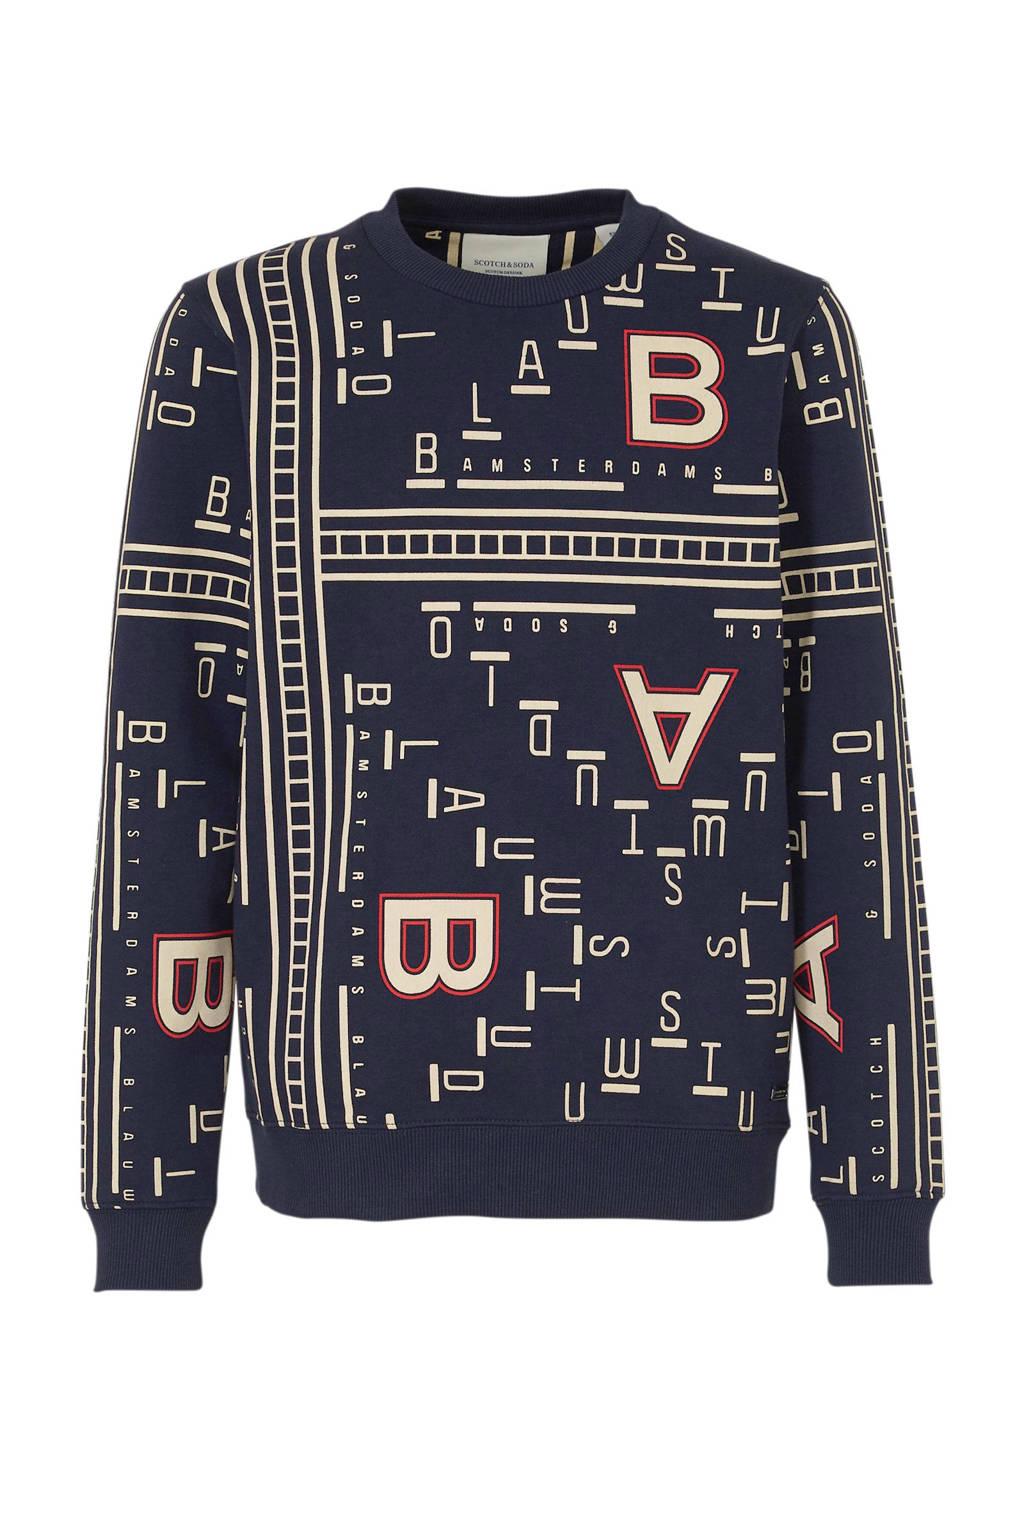 Scotch & Soda Amsterdams Blauw sweater met all over print donkerblauw/ecru/oranje, Donkerblauw/ecru/oranje